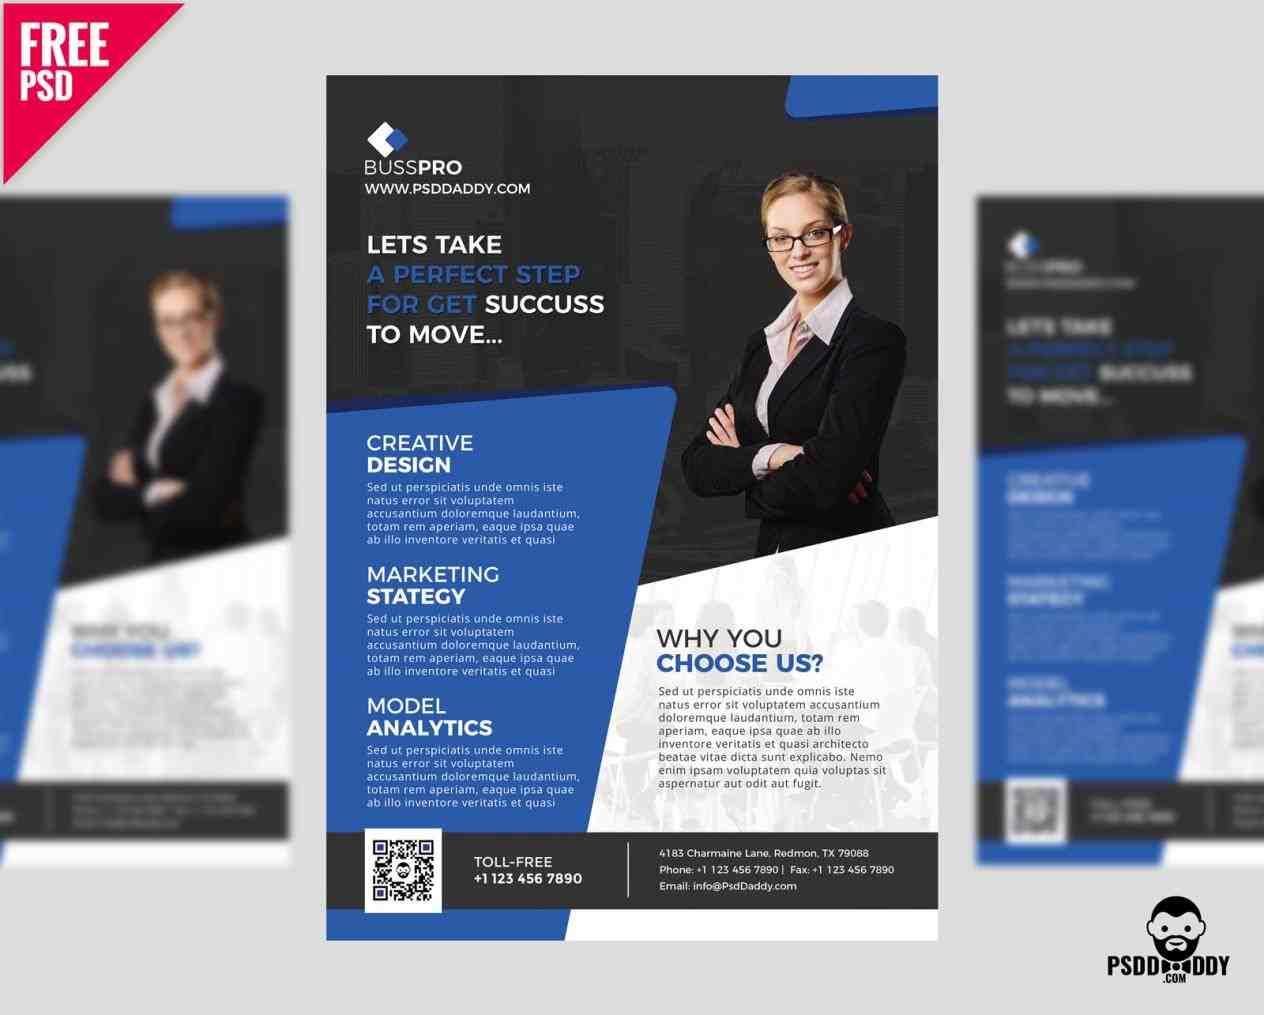 business Business Flyer Template flyer template free psd u uxfreecomrhuxfreecom cerberus elegant premium rhtemplatescatalogcom cerberus Business Flyer Template elegant